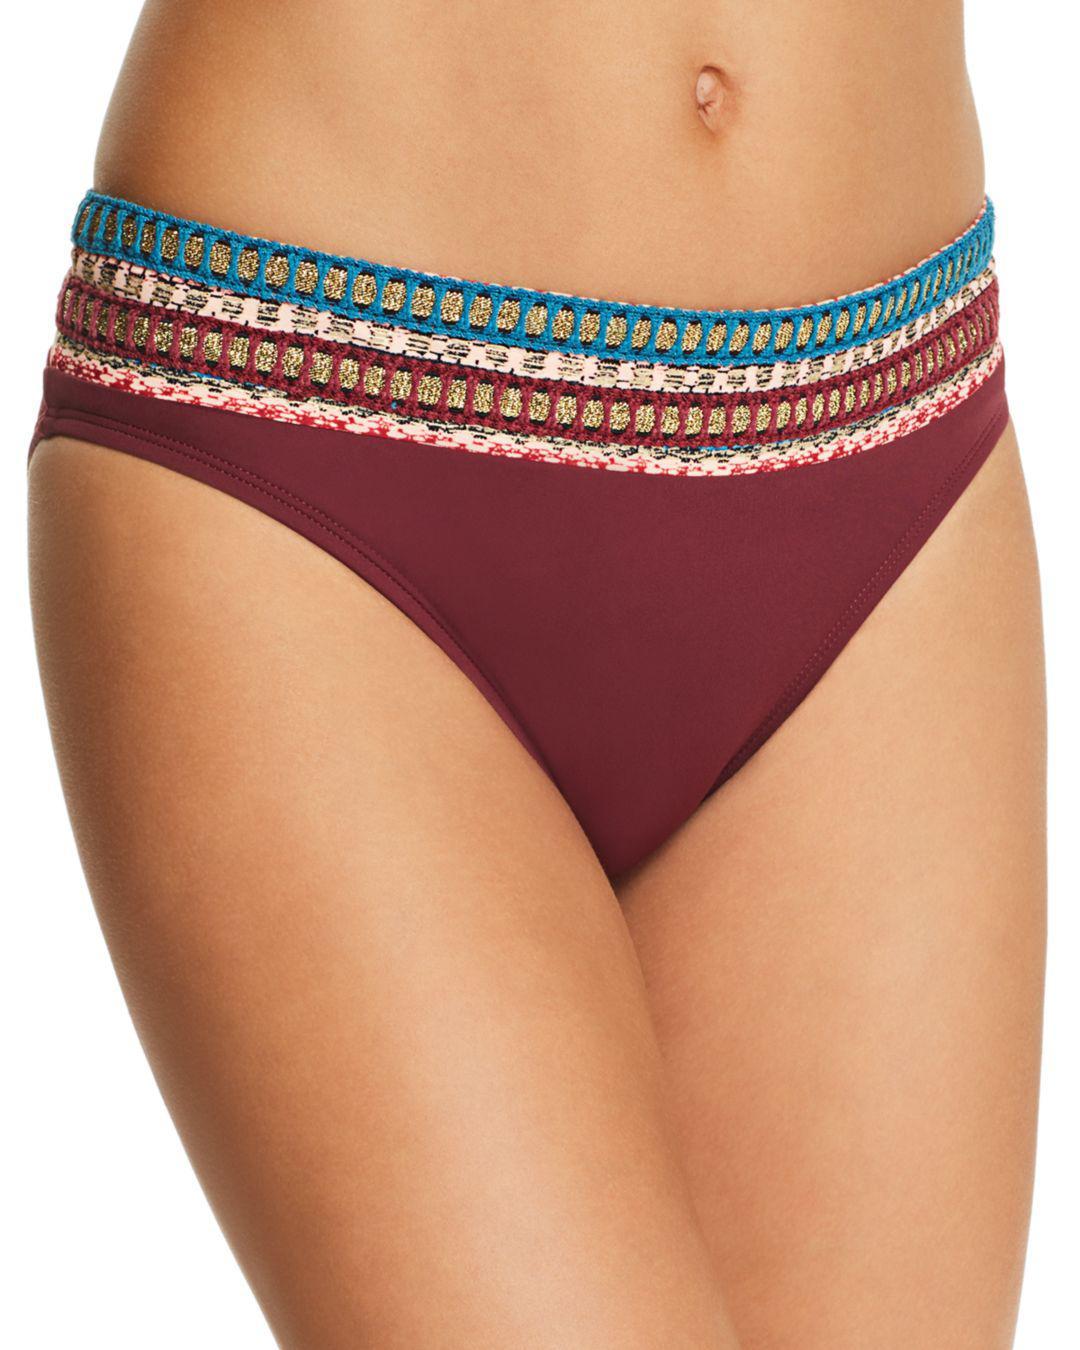 13ddb6713b5c4 Lyst - La Blanca Running Stitch Hipster Bikini Bottom in Red